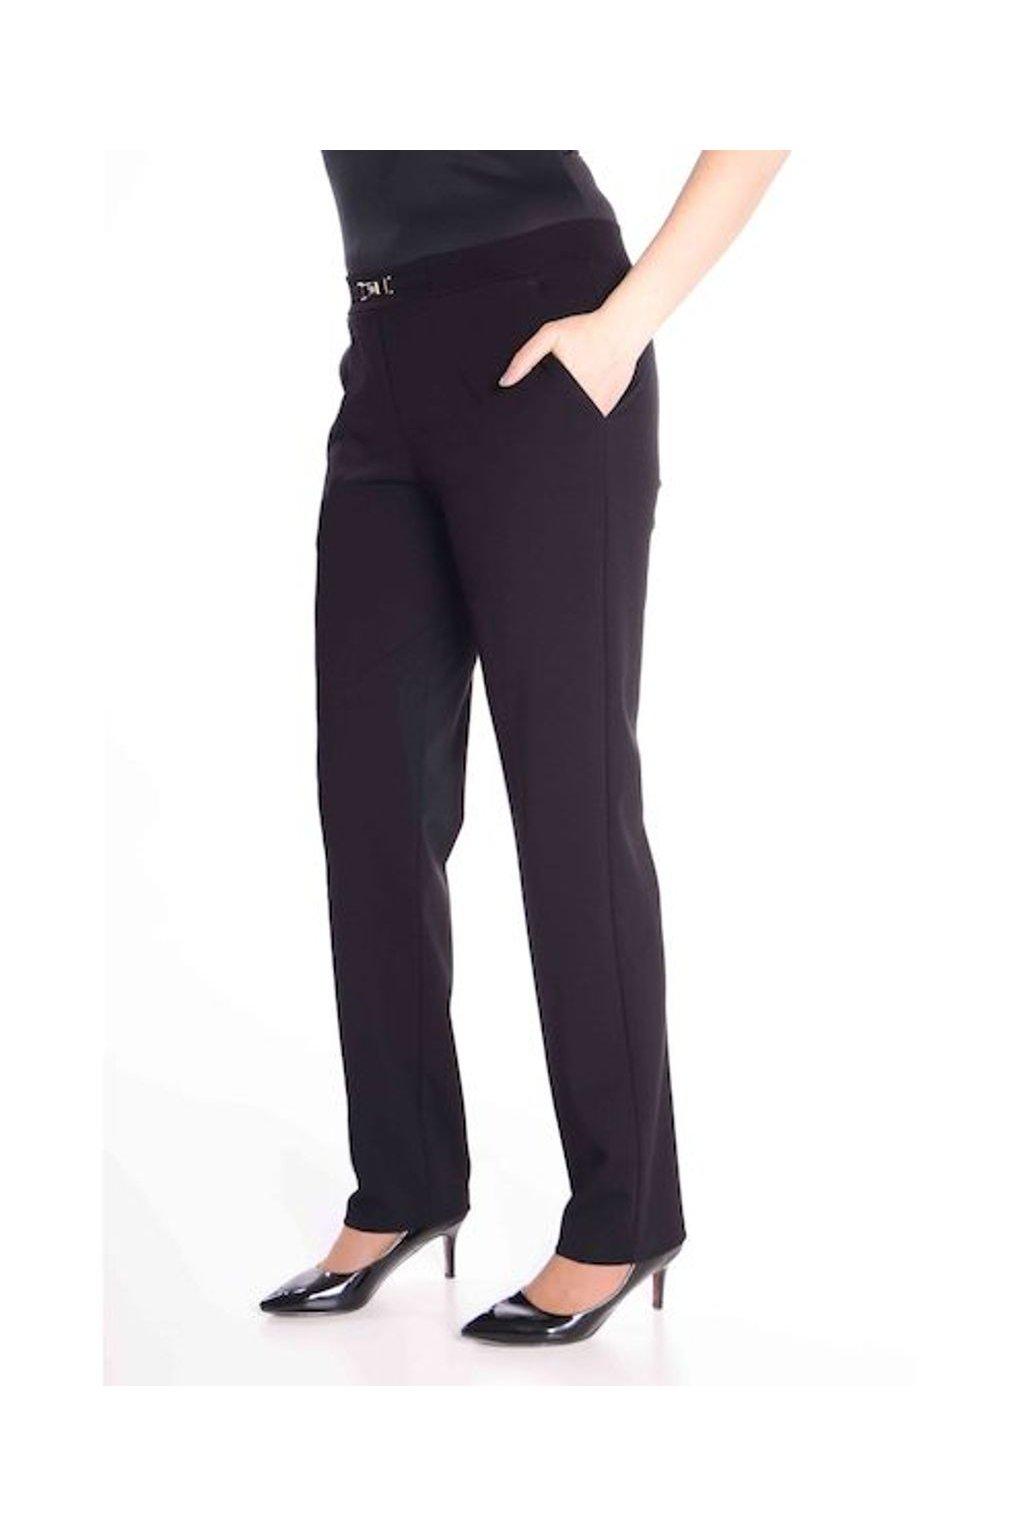 67T Kalhoty Avanti (Velikost 36, Barva Černá)